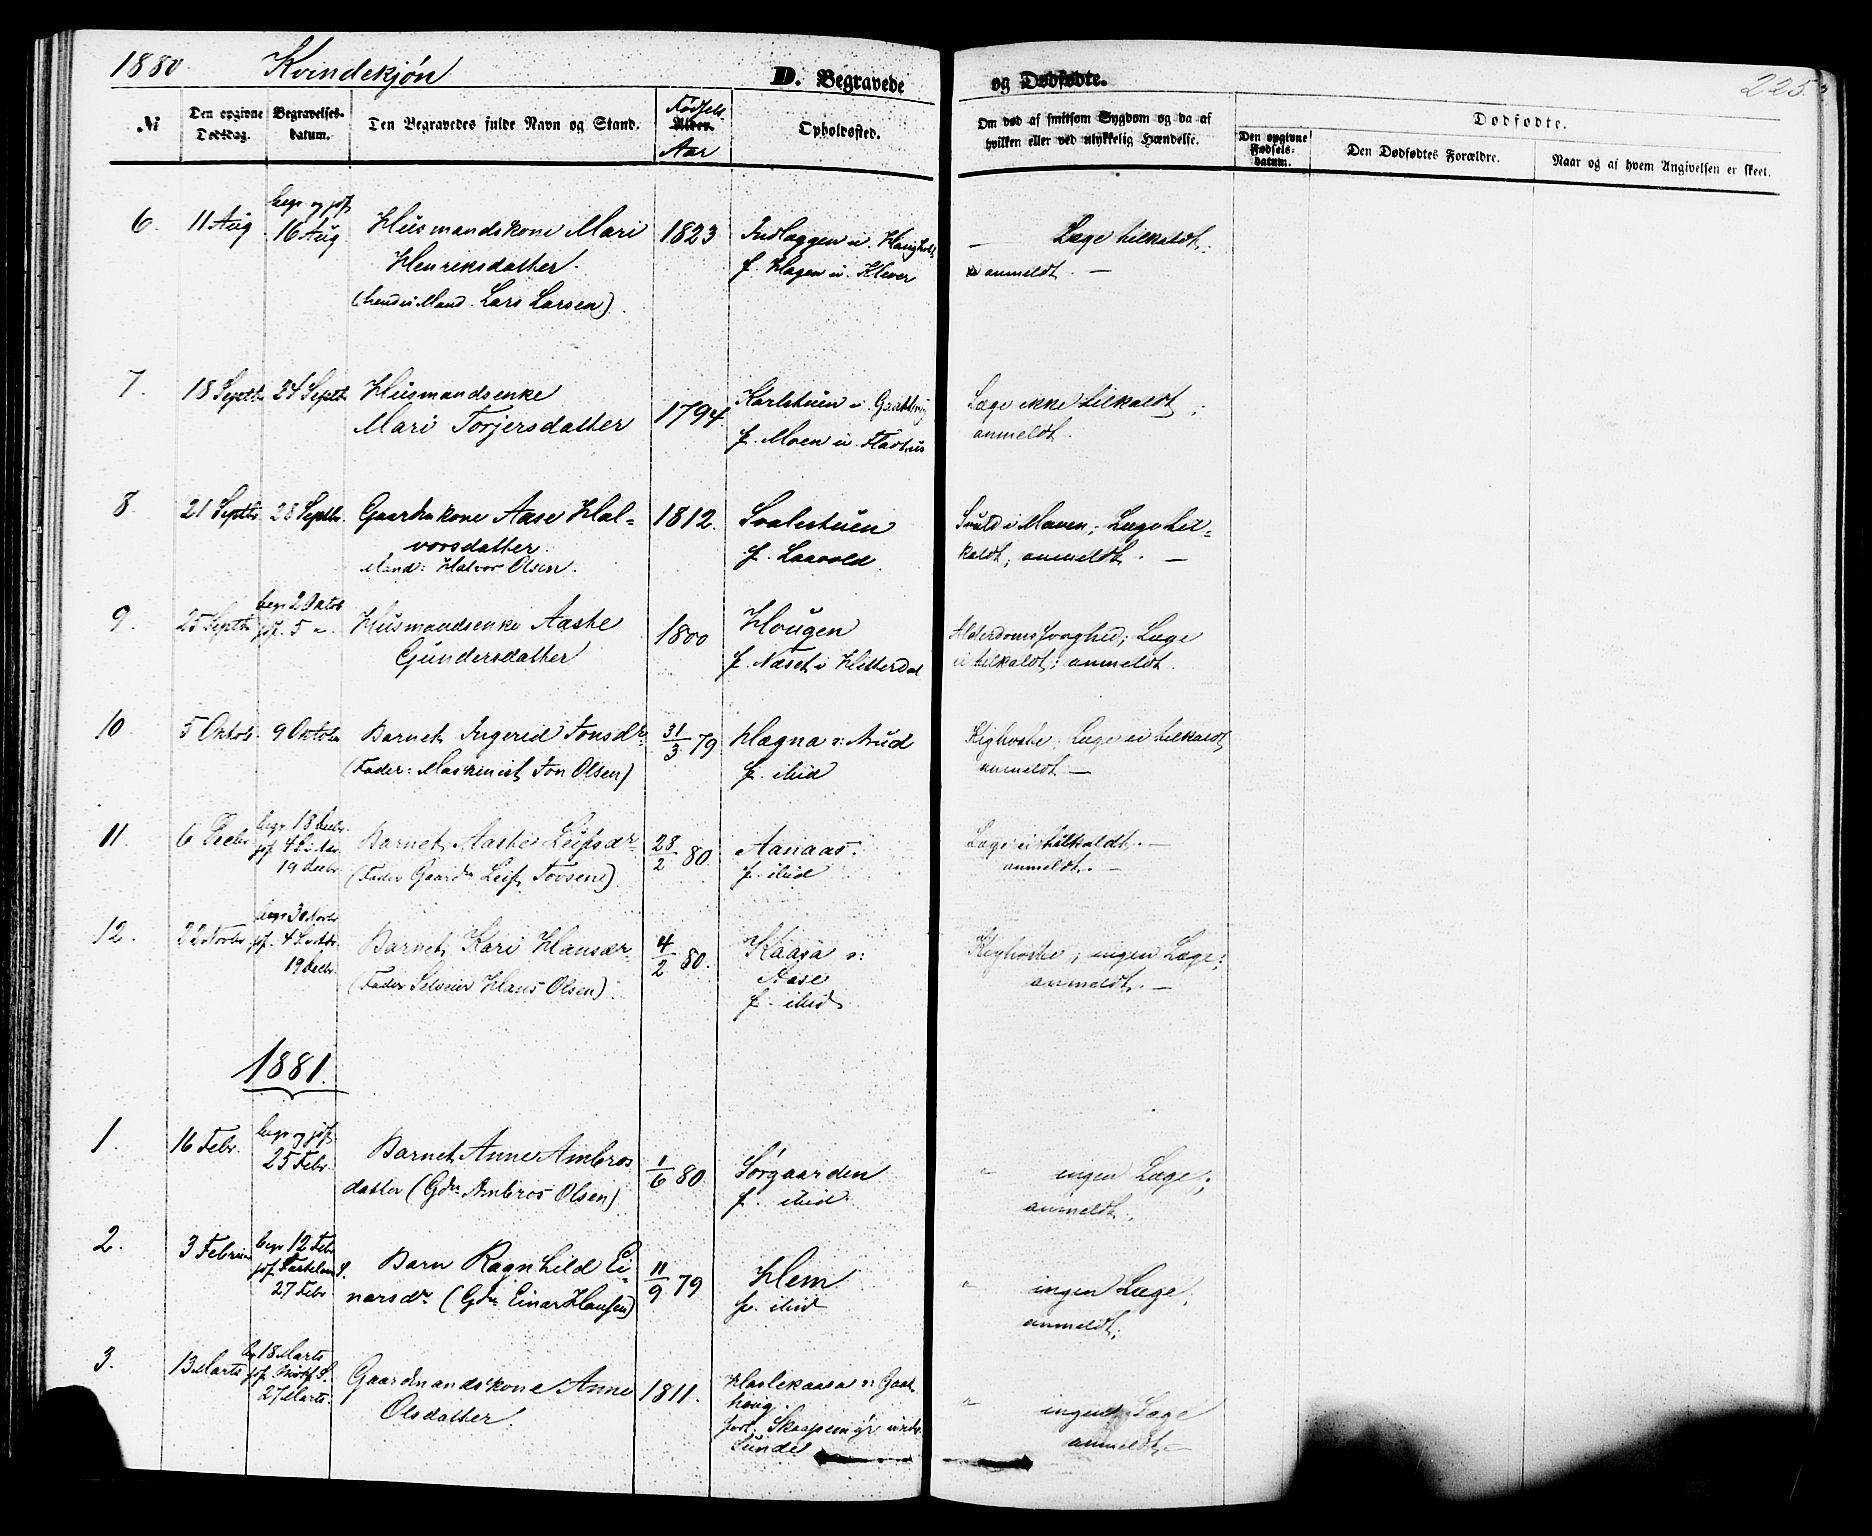 SAKO, Sauherad kirkebøker, F/Fa/L0008: Ministerialbok nr. I 8, 1873-1886, s. 225